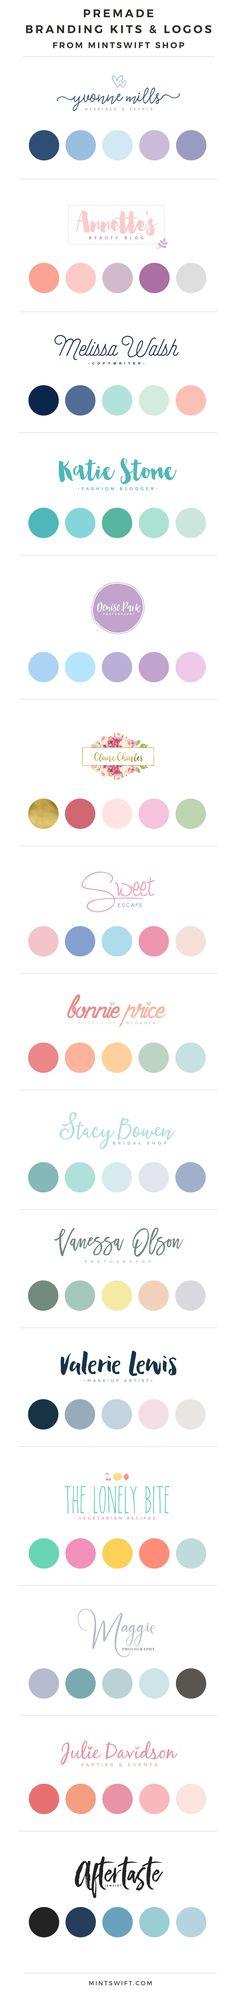 Premade Branding Kits